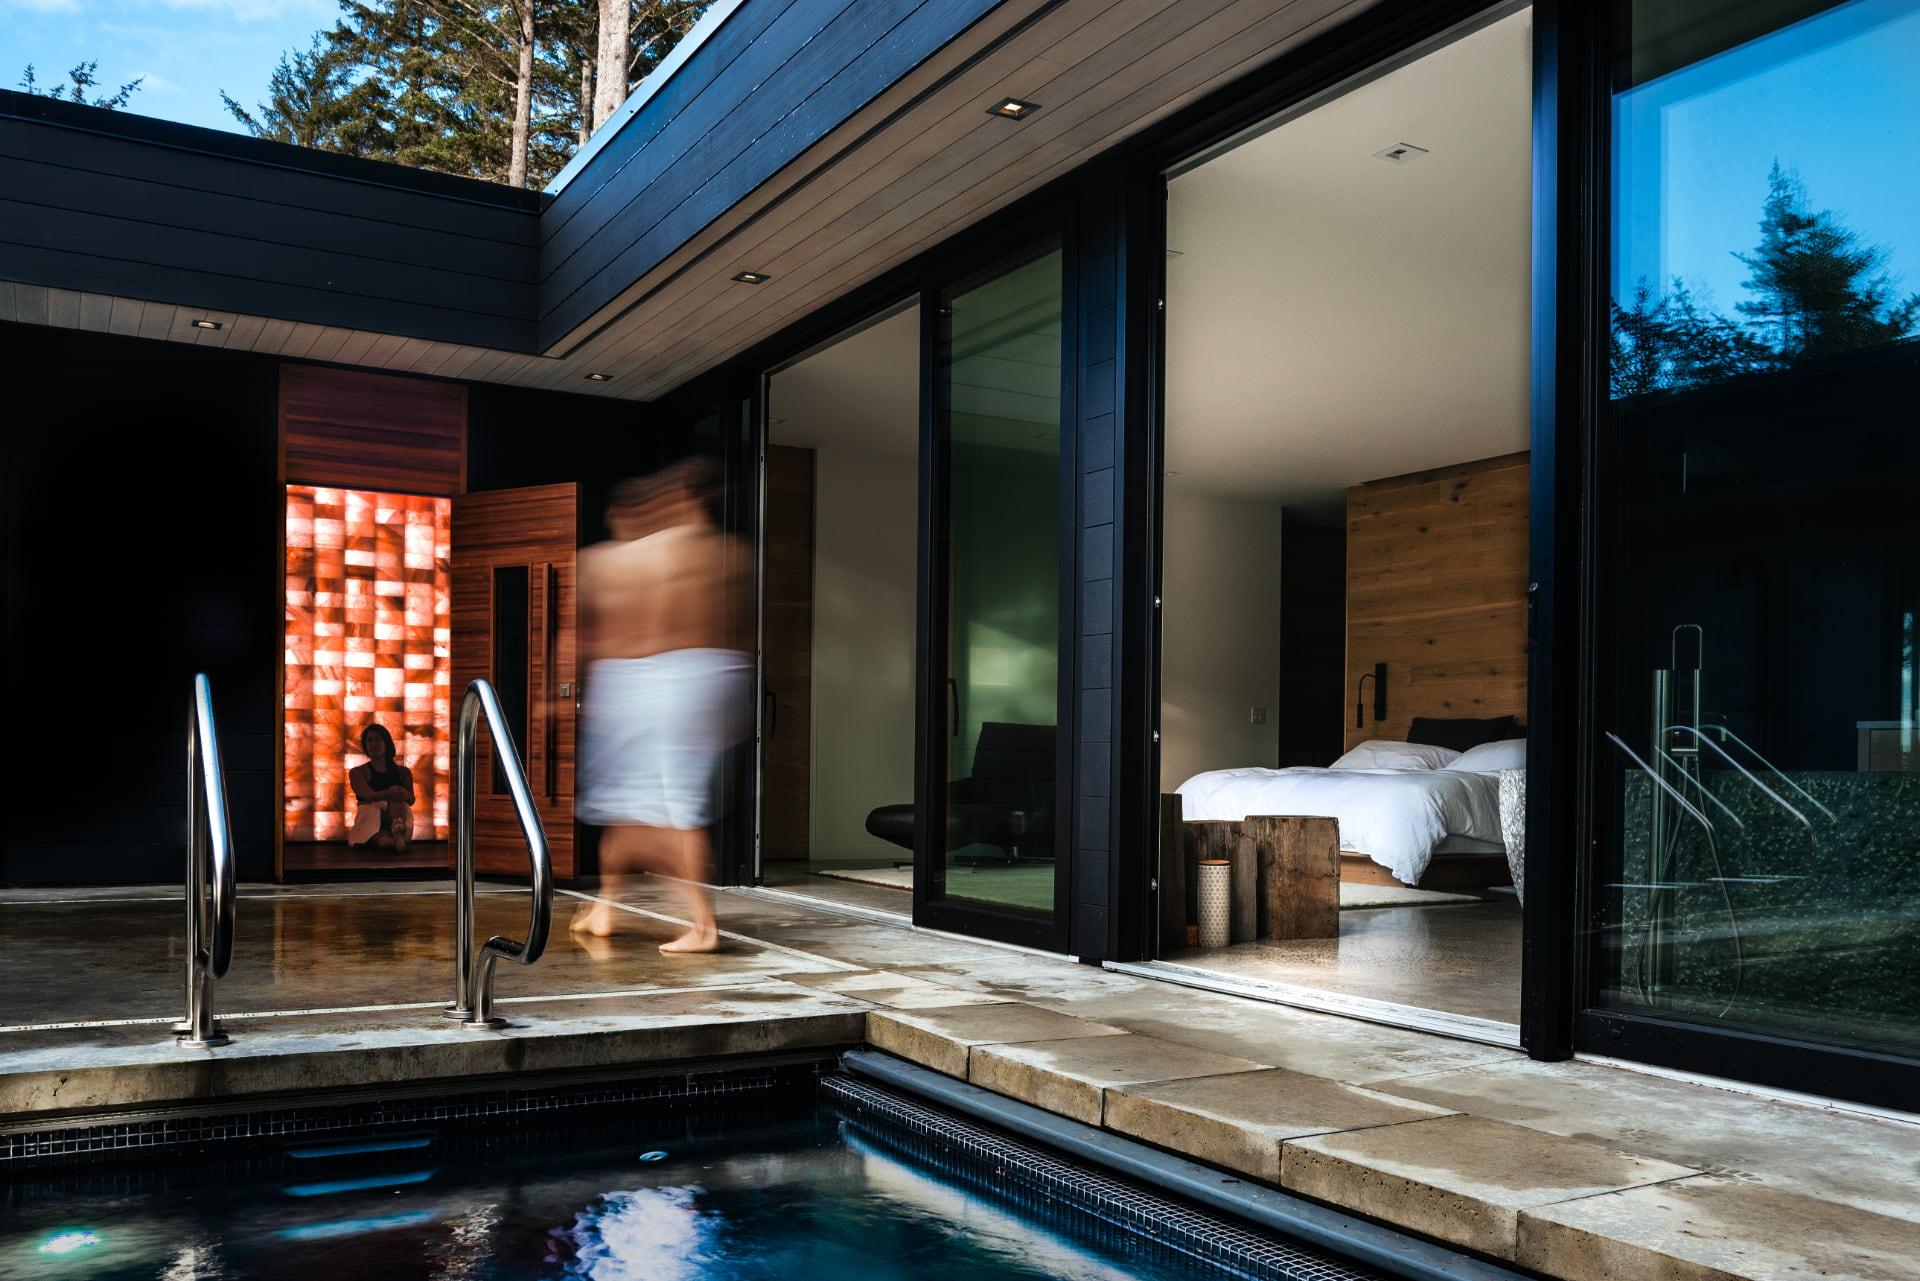 custom salt sauna by pool in tofino - circle wellness studios